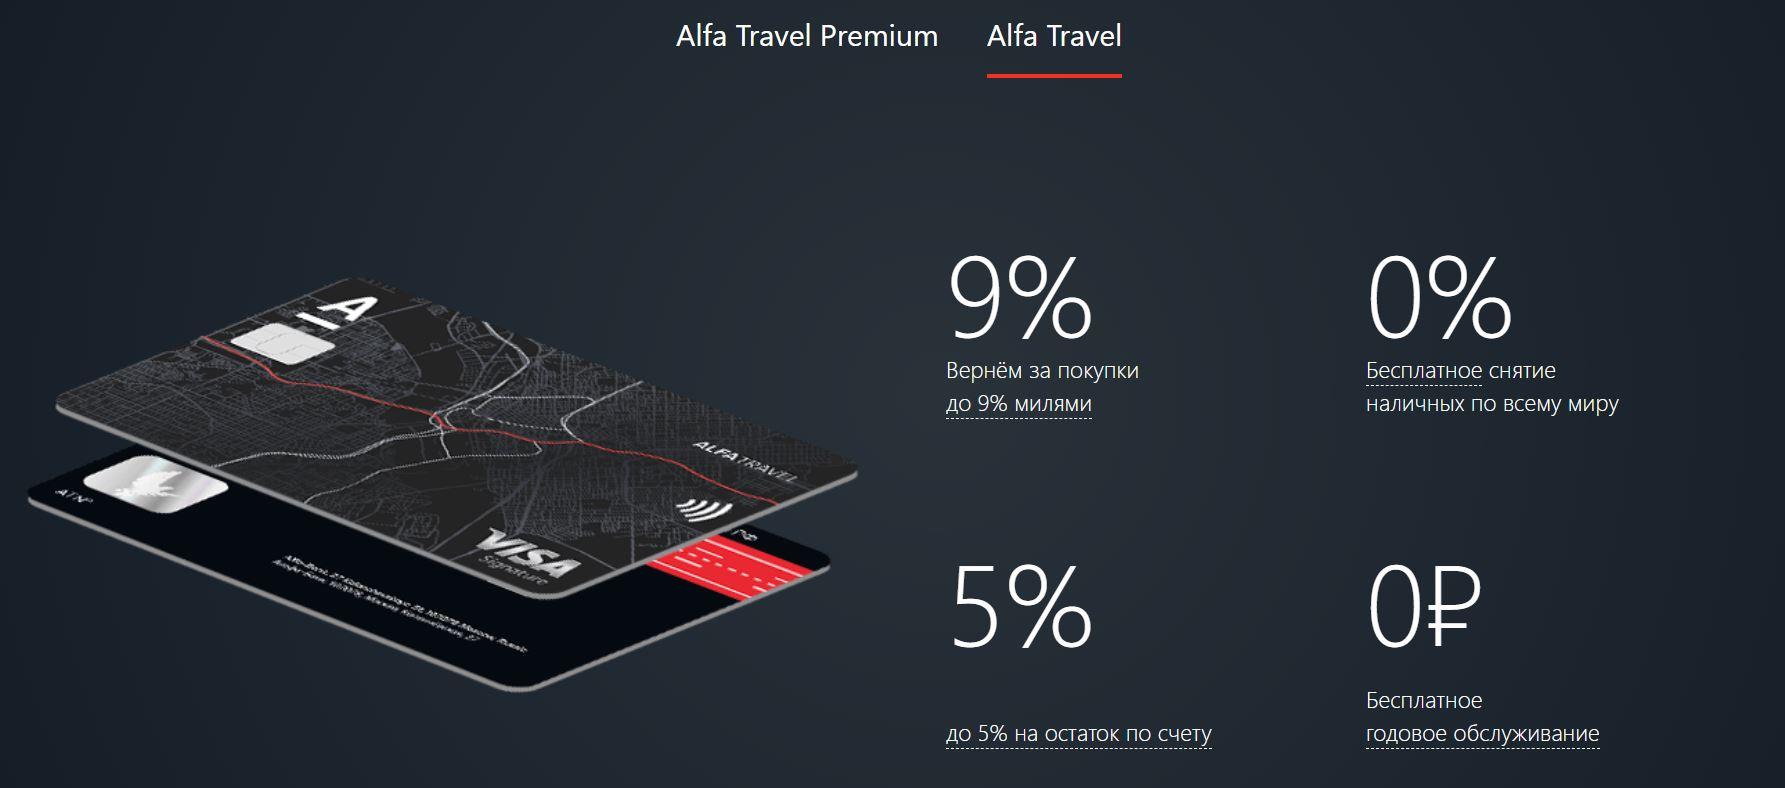 Дебетовая карта Alfa Travel для путешествий. Условия, мили, тарифы